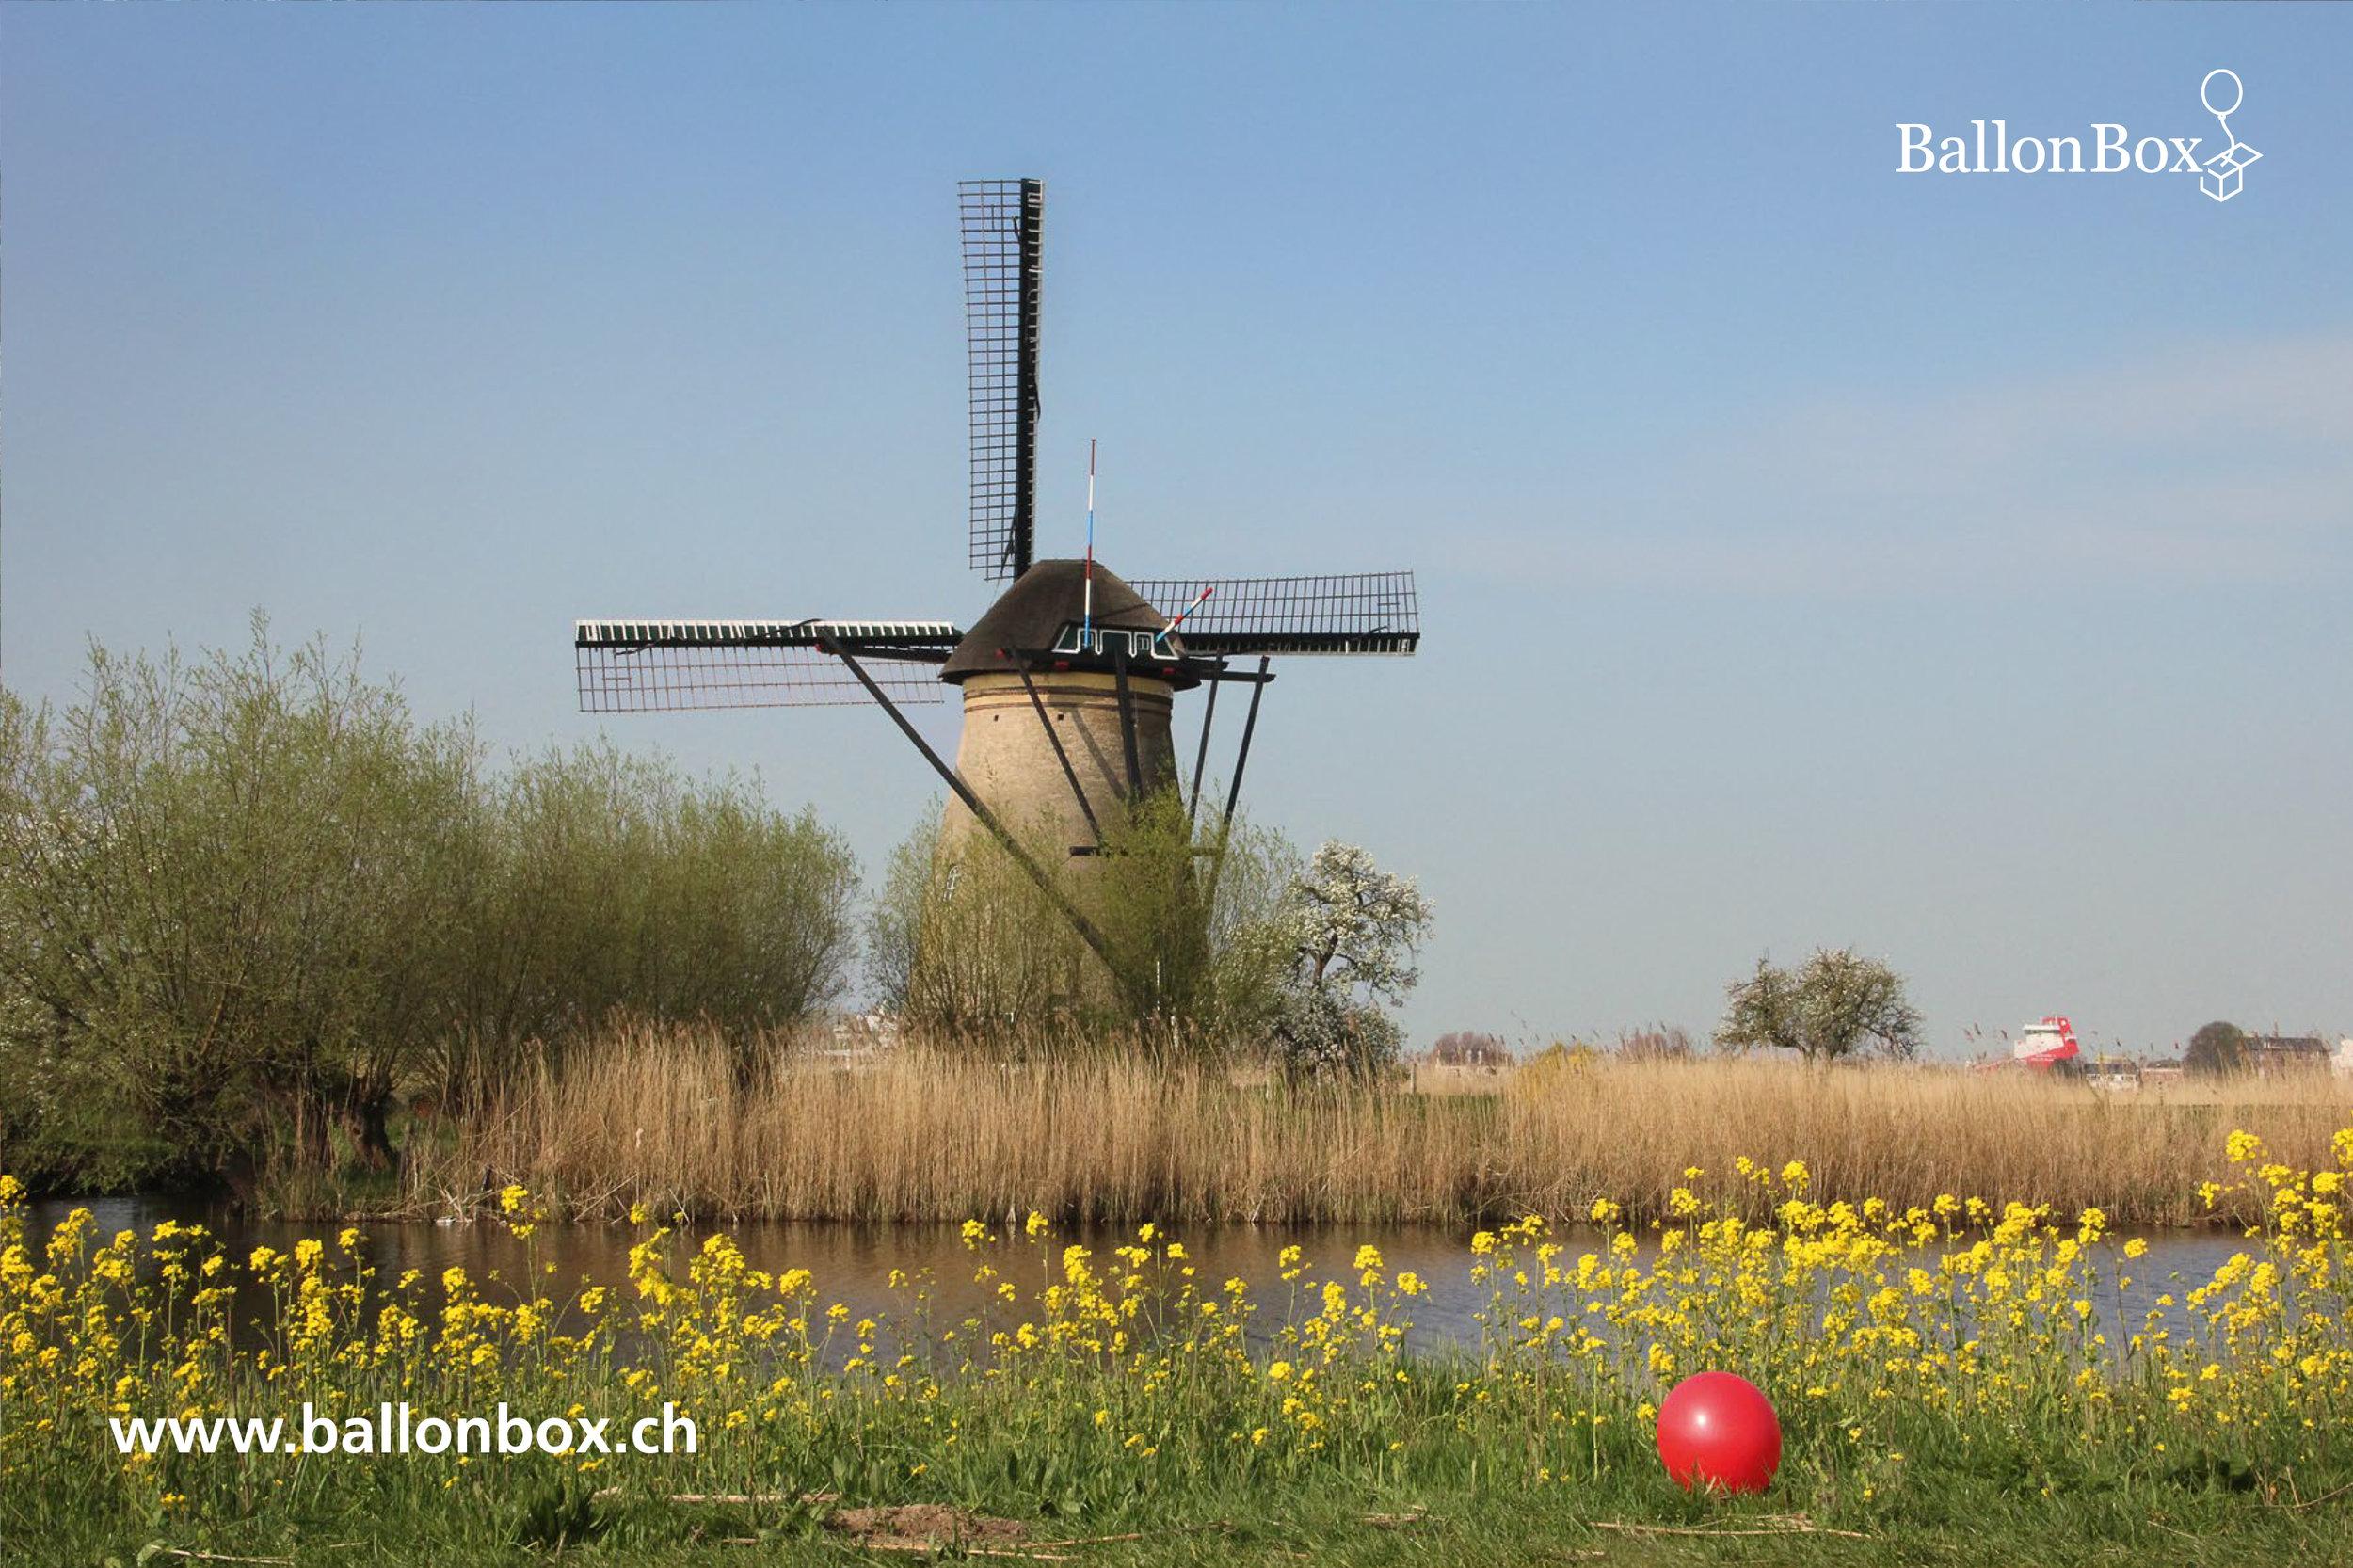 BallonBox_Kalender_18_05.jpg